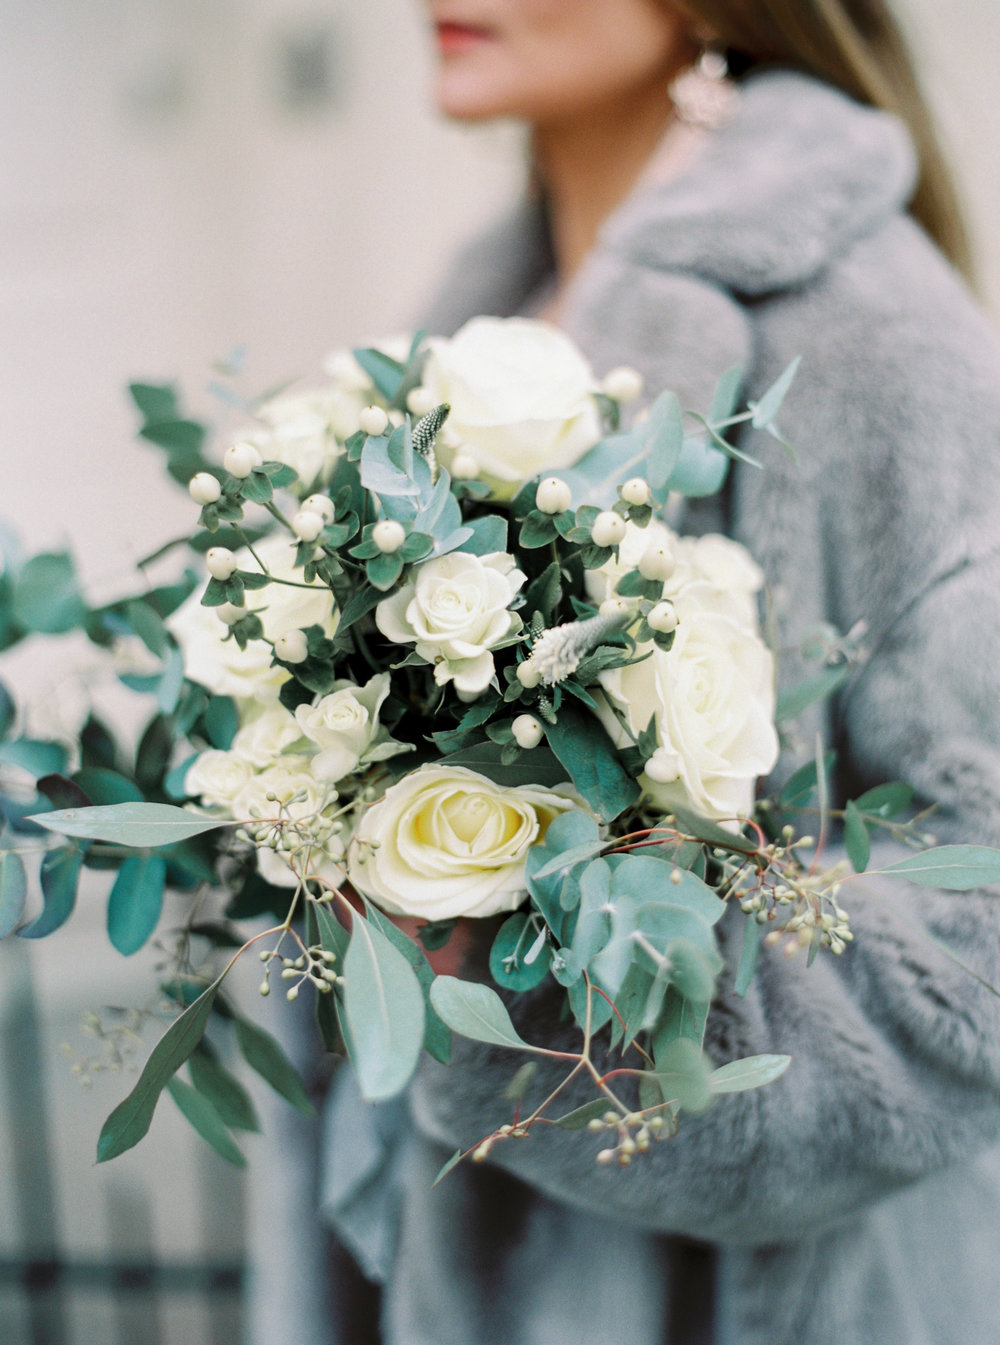 Luxury Wedding Planner UK | Our Chic & Romantic Engagement Shoot in Bath | Katie Julia Photography - 16.JPG